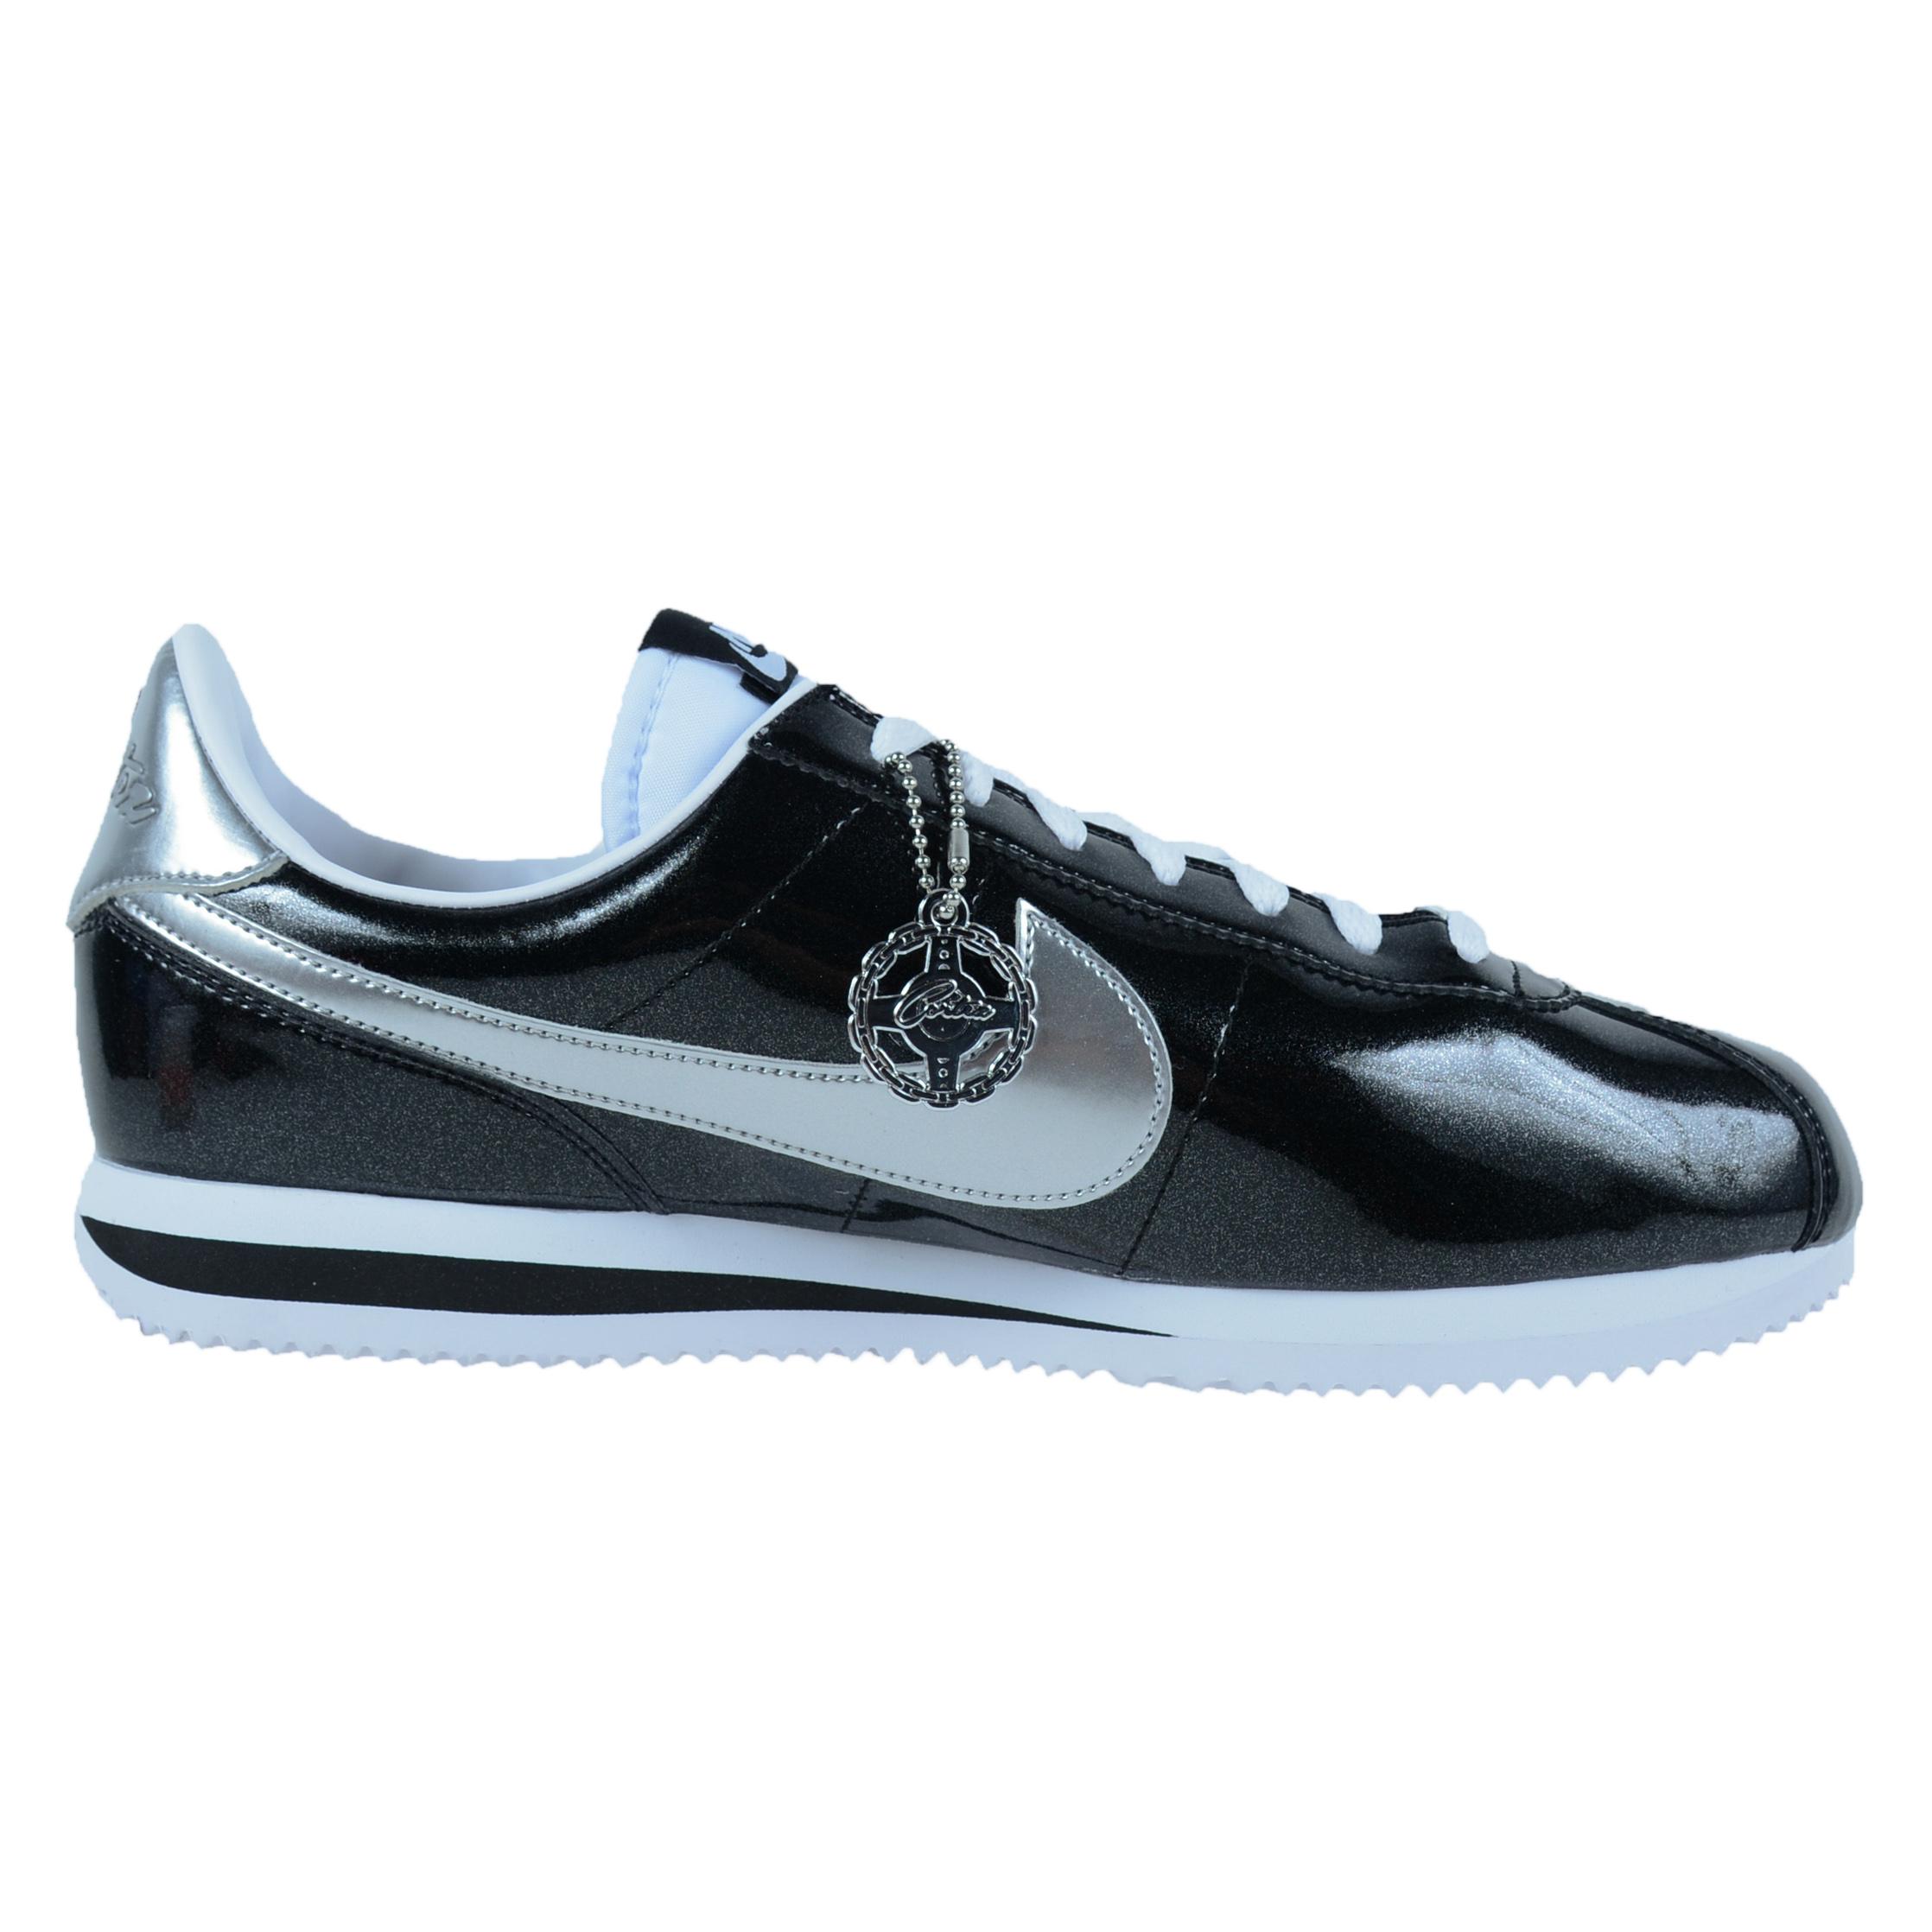 ... nike cortez basic premium qs casual shoes black white metallic silver  819721 001 ...